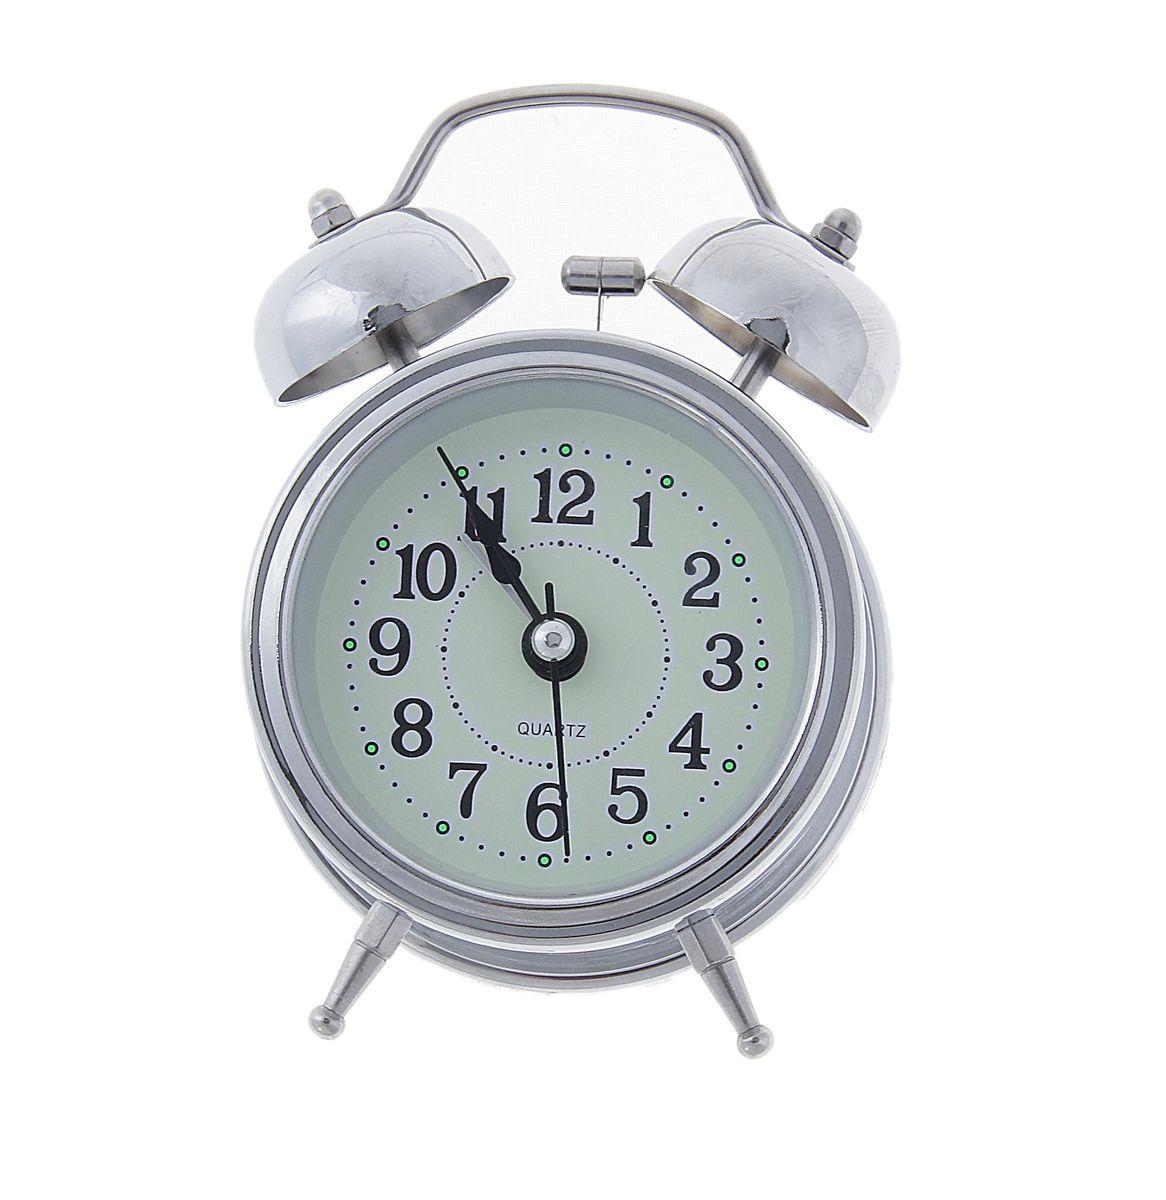 Часы-будильник Sima-land Классика, цвет: серебристый часы будильник sima land жду встречи